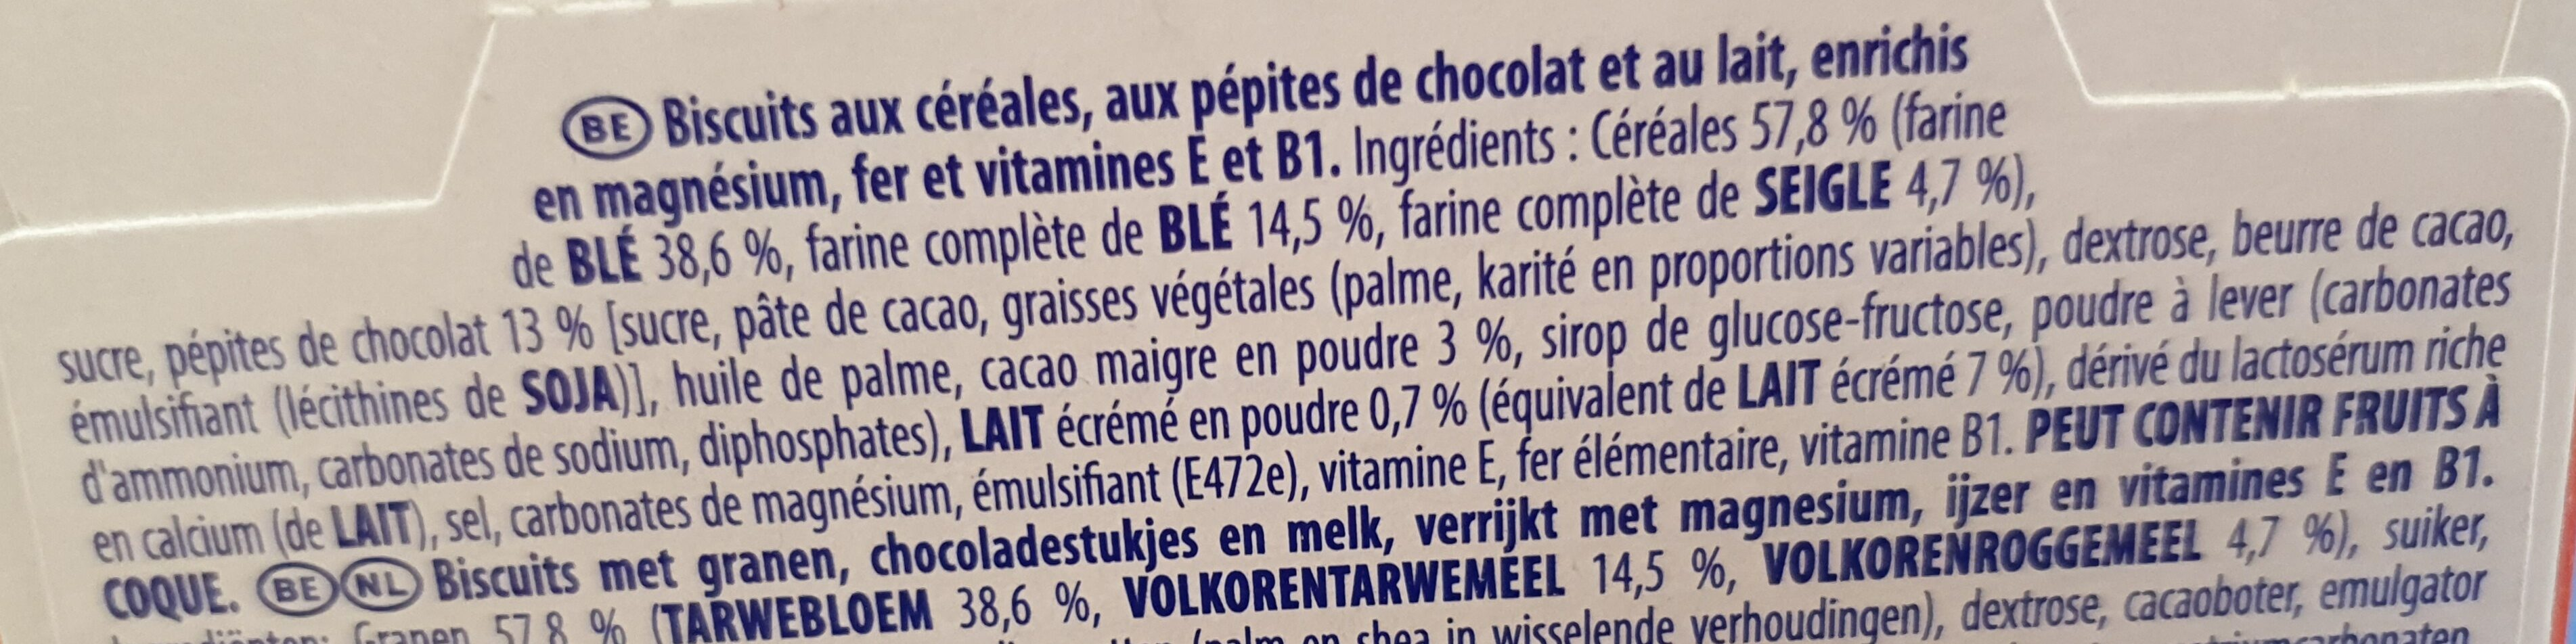 Prince Start Choco - Ingrédients - fr